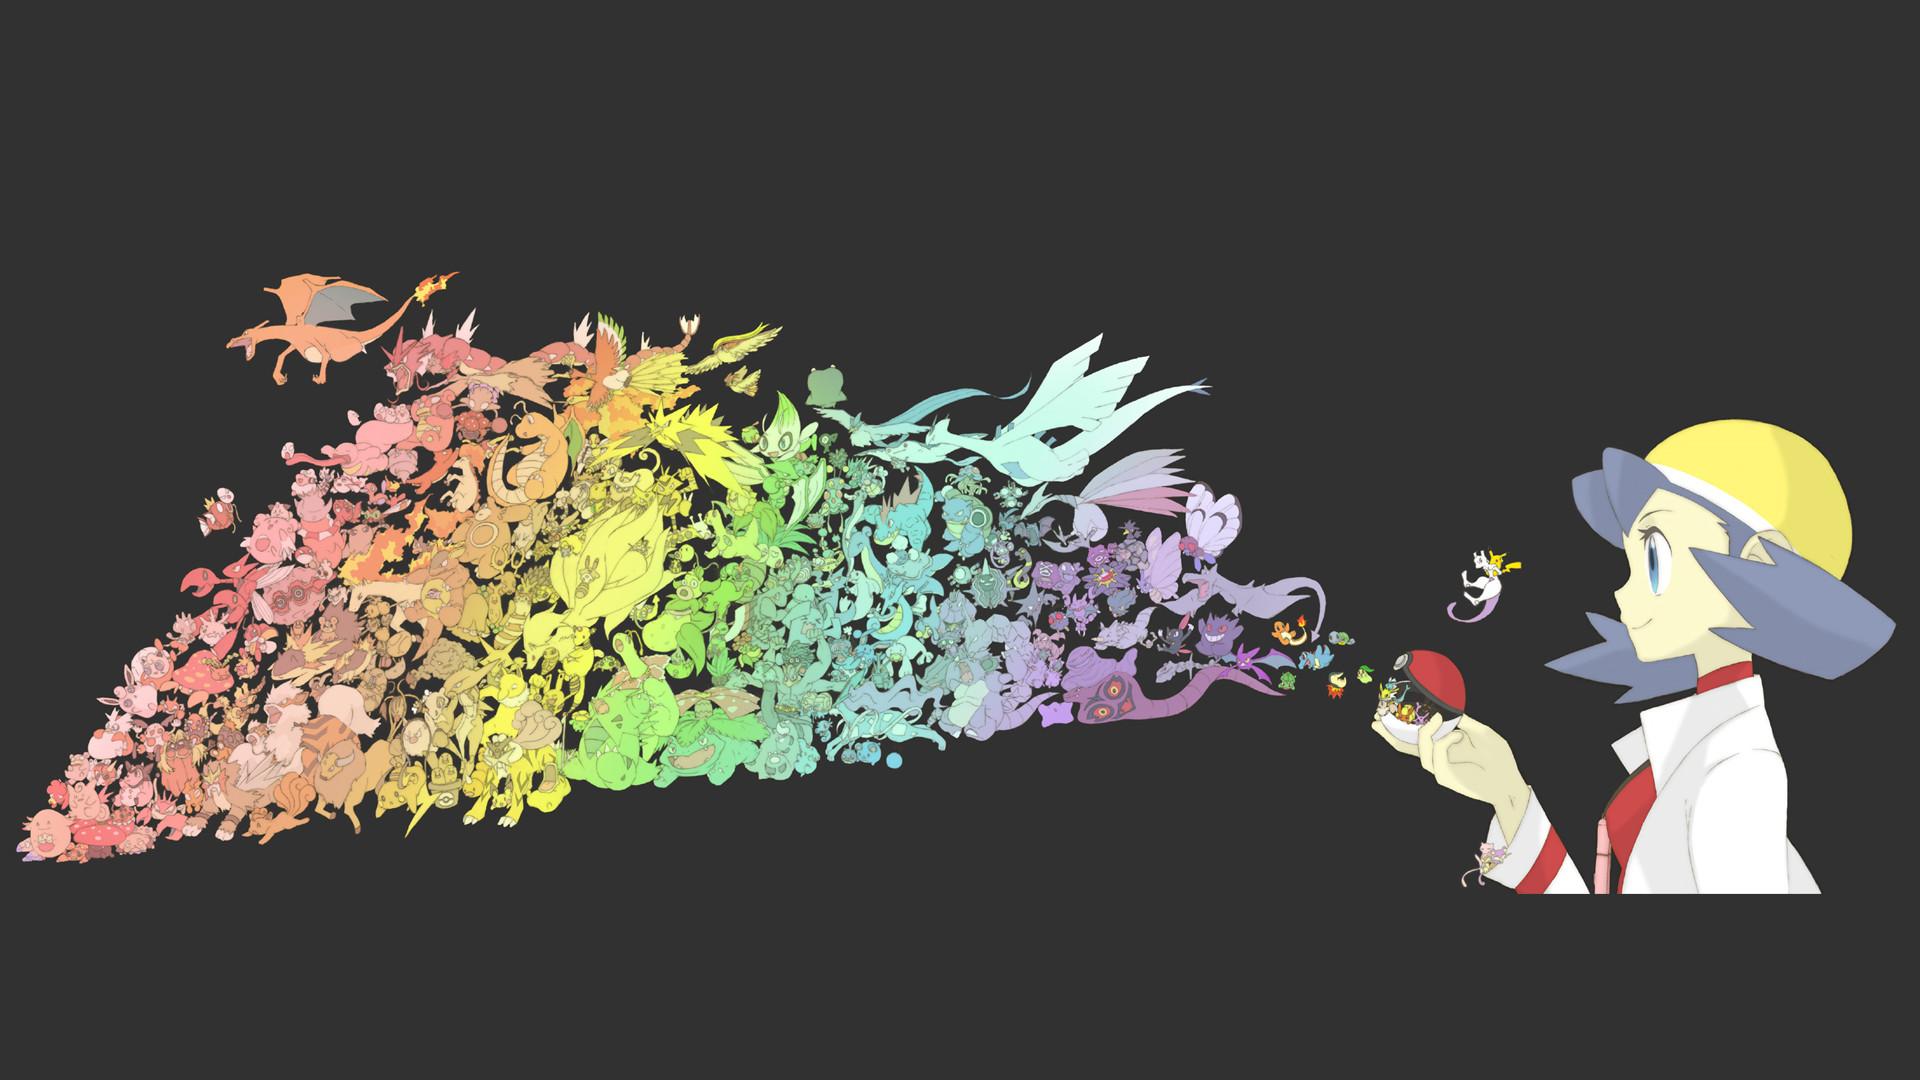 Pokemon Wallpaper 1920x1080 63 Images